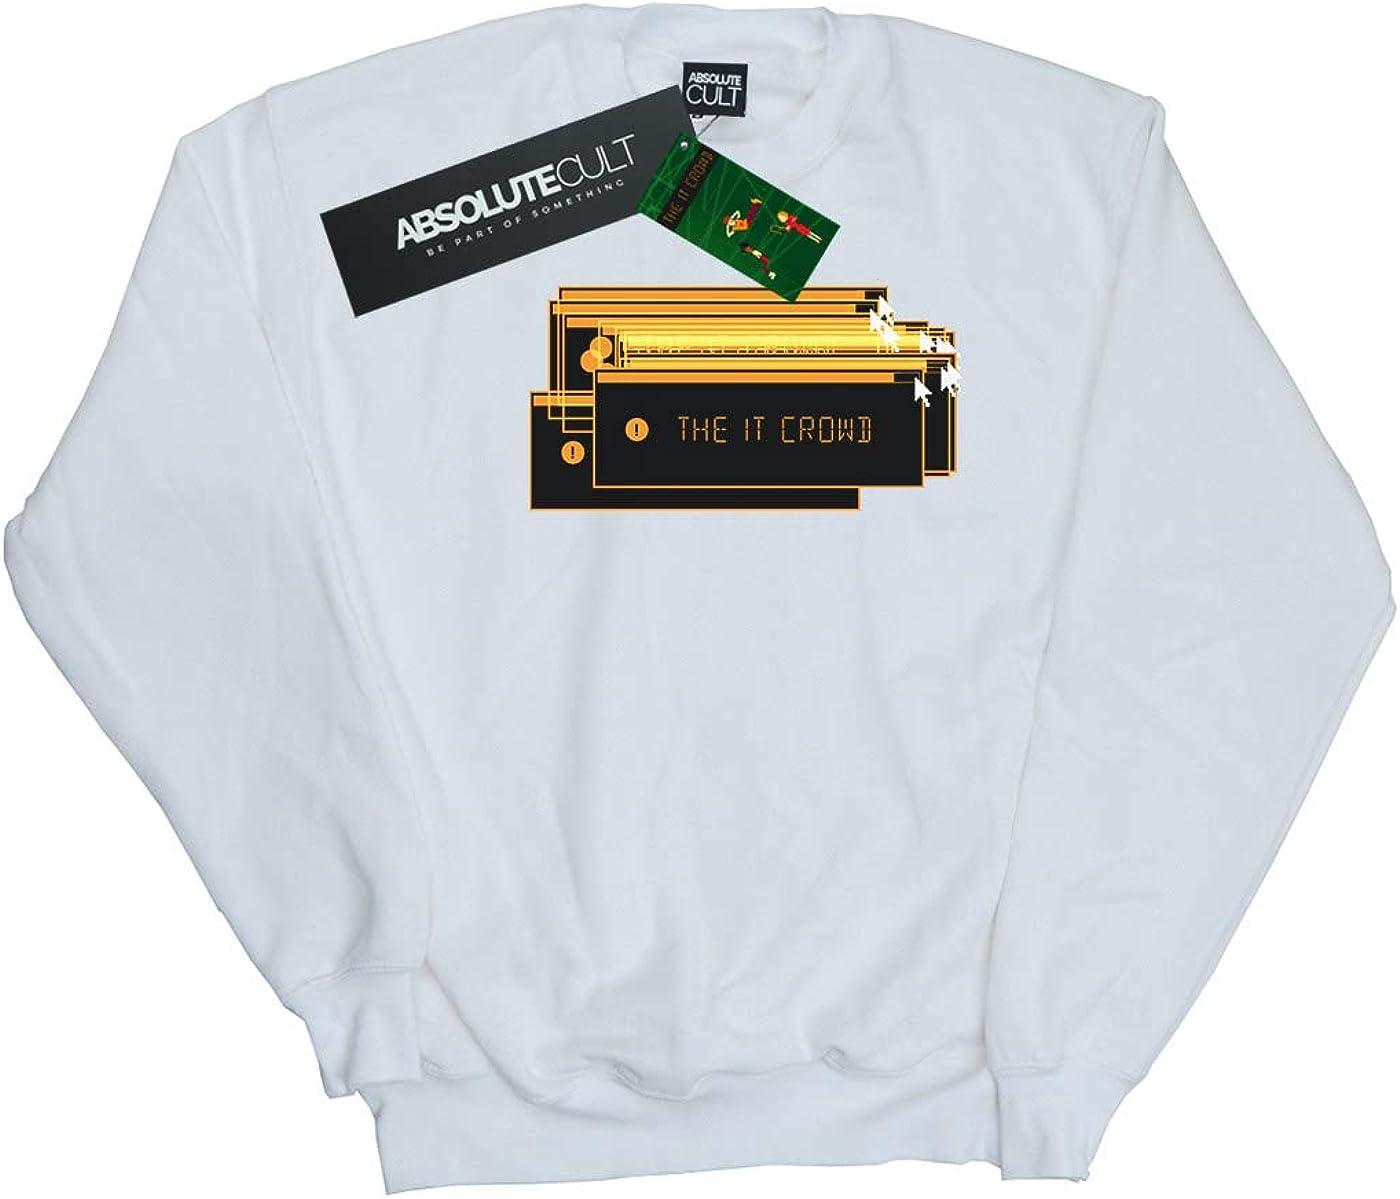 Absolute Cult The IT Crowd Girls Error Screens Sweatshirt